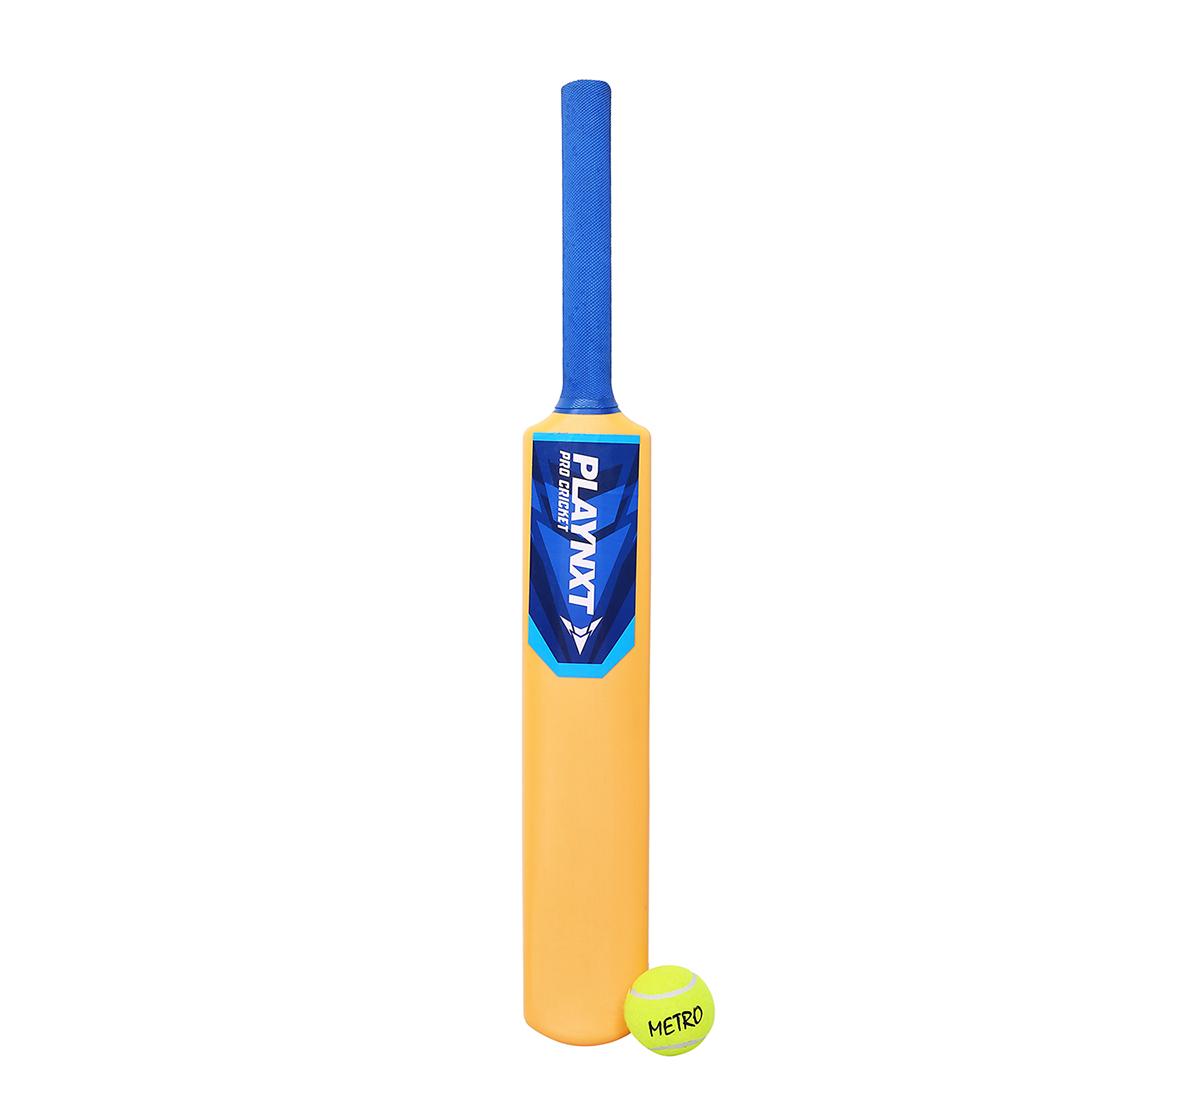 Playnxt | Playnxt Pro Cricket Bat No. 4 , 6Y+ (Ivory Yellow )